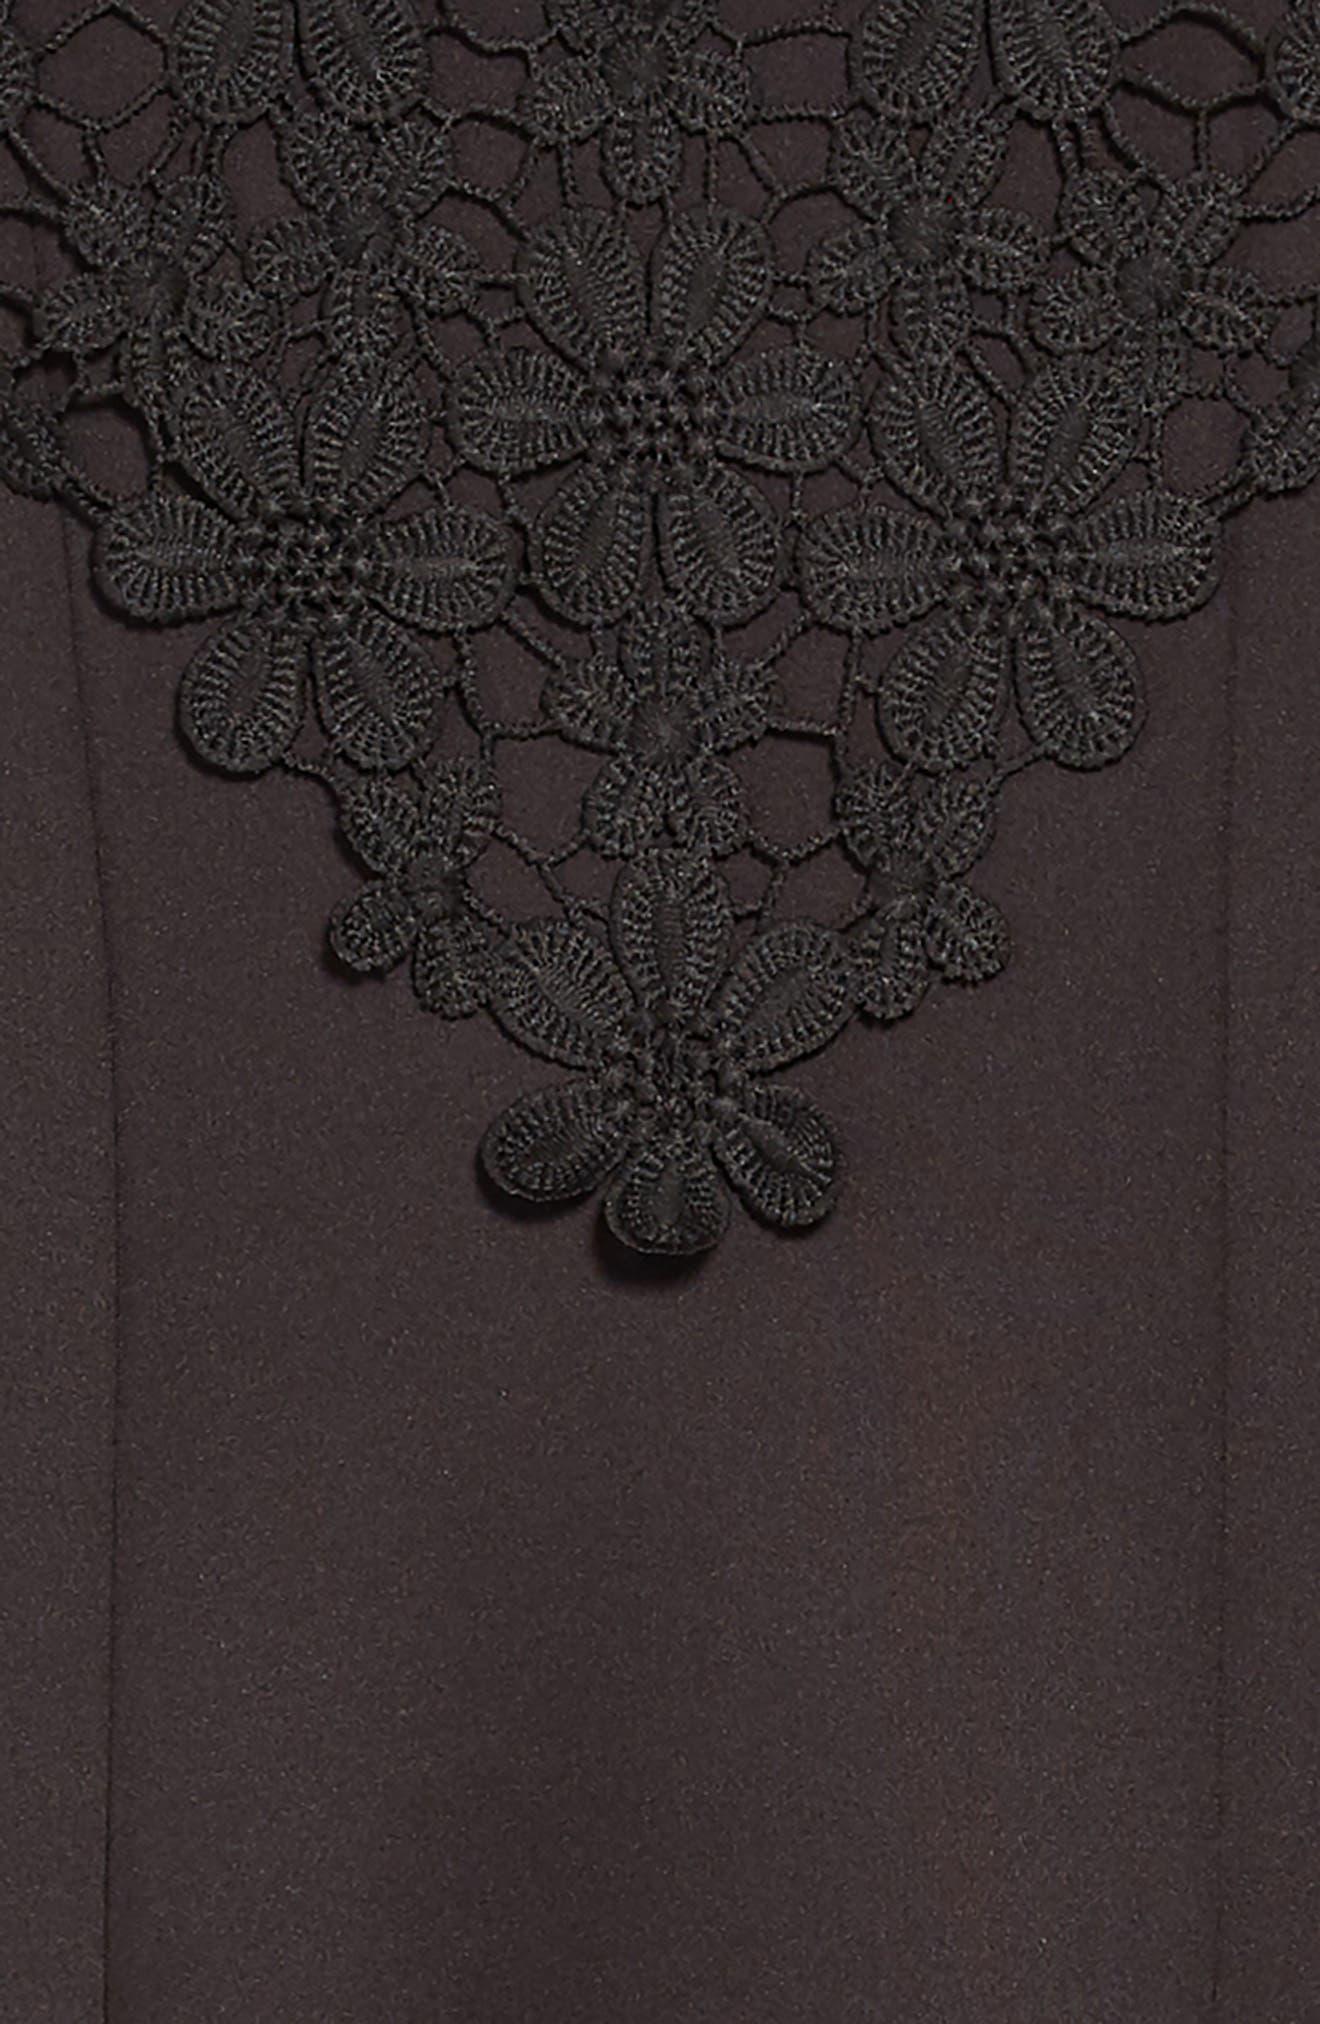 Floral Lace Skater Dress,                             Alternate thumbnail 3, color,                             BLACK